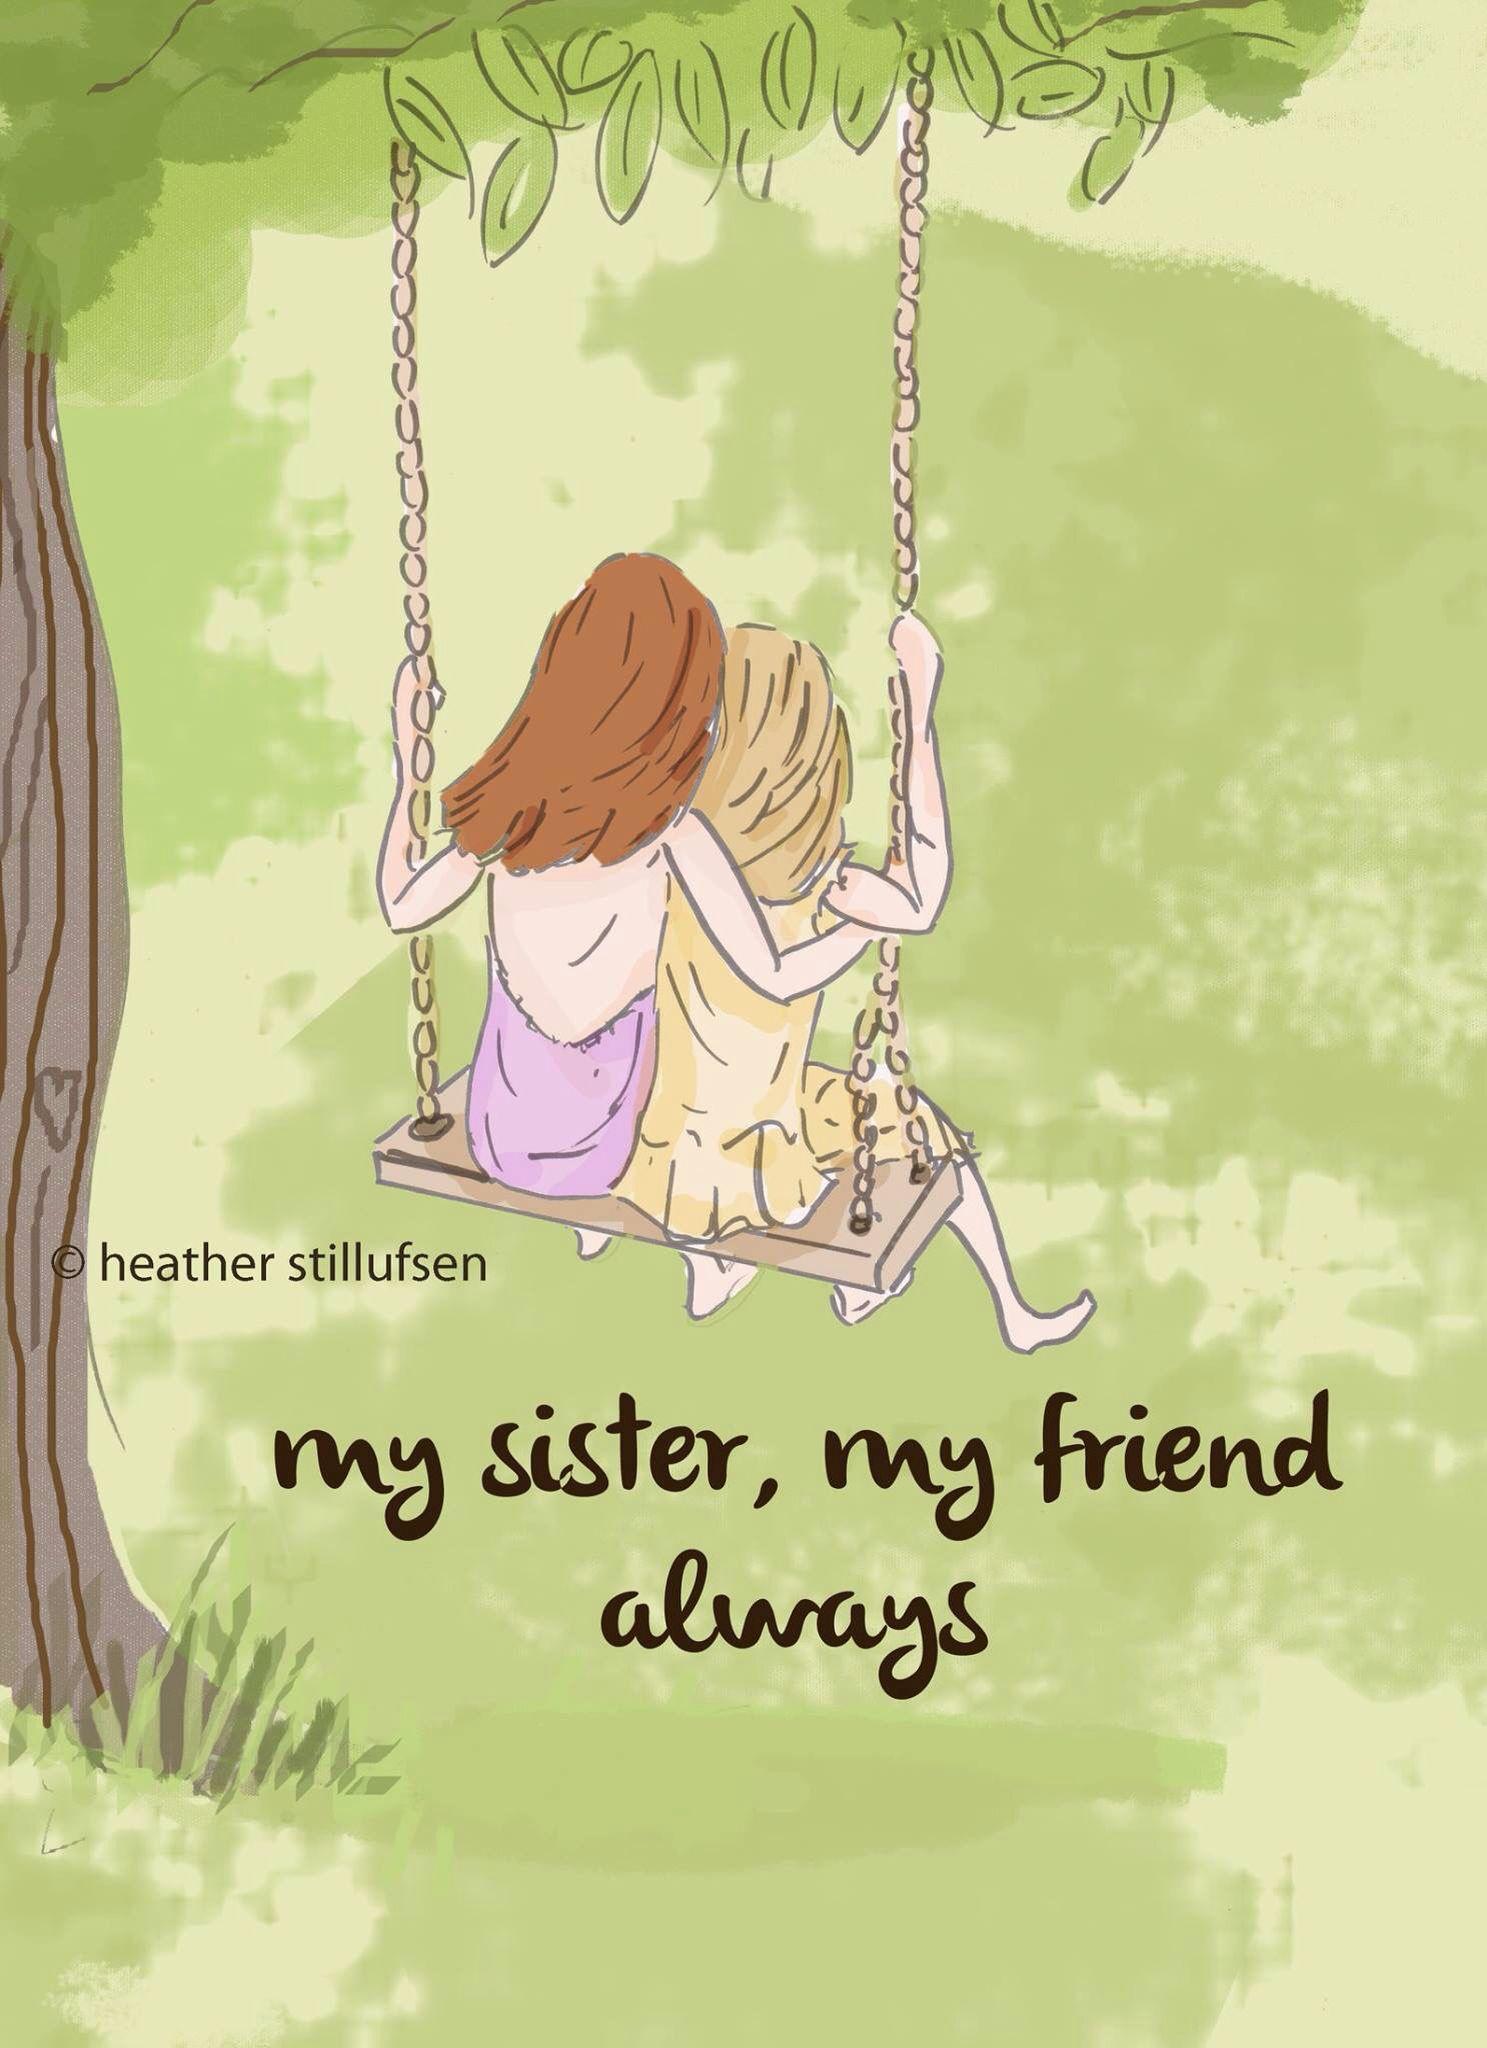 Sister Wall Art - Sisters Digital Art Print - Sisters - Children\'s ...